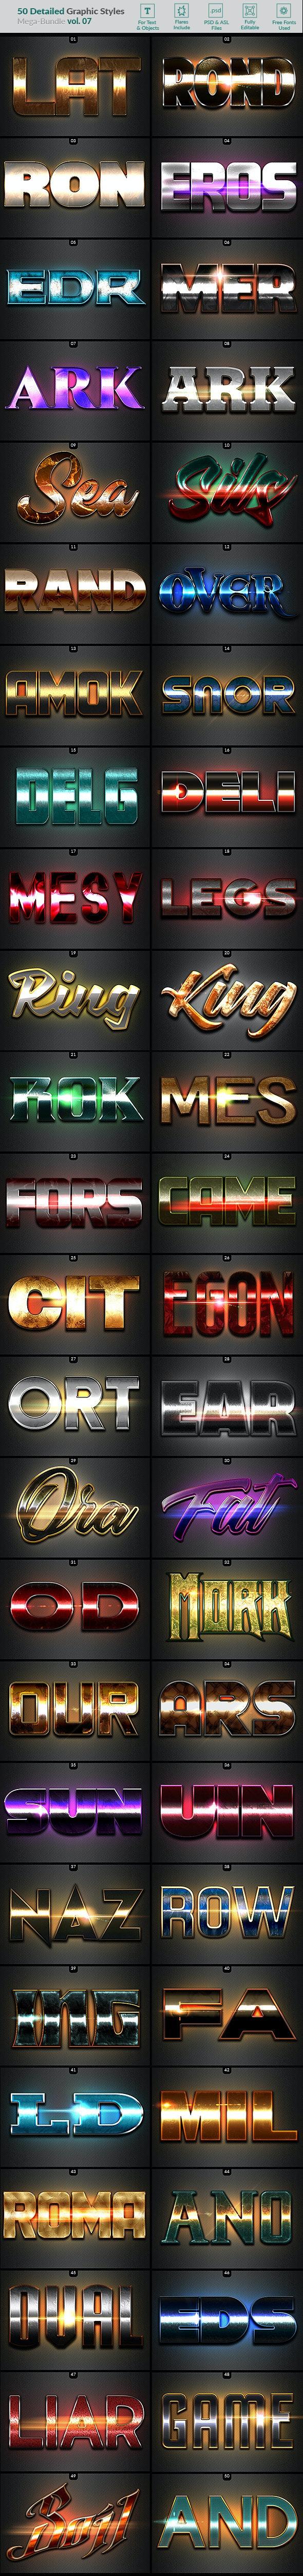 50 Text Effects - Bundle Vol. 07 - Styles Photoshop